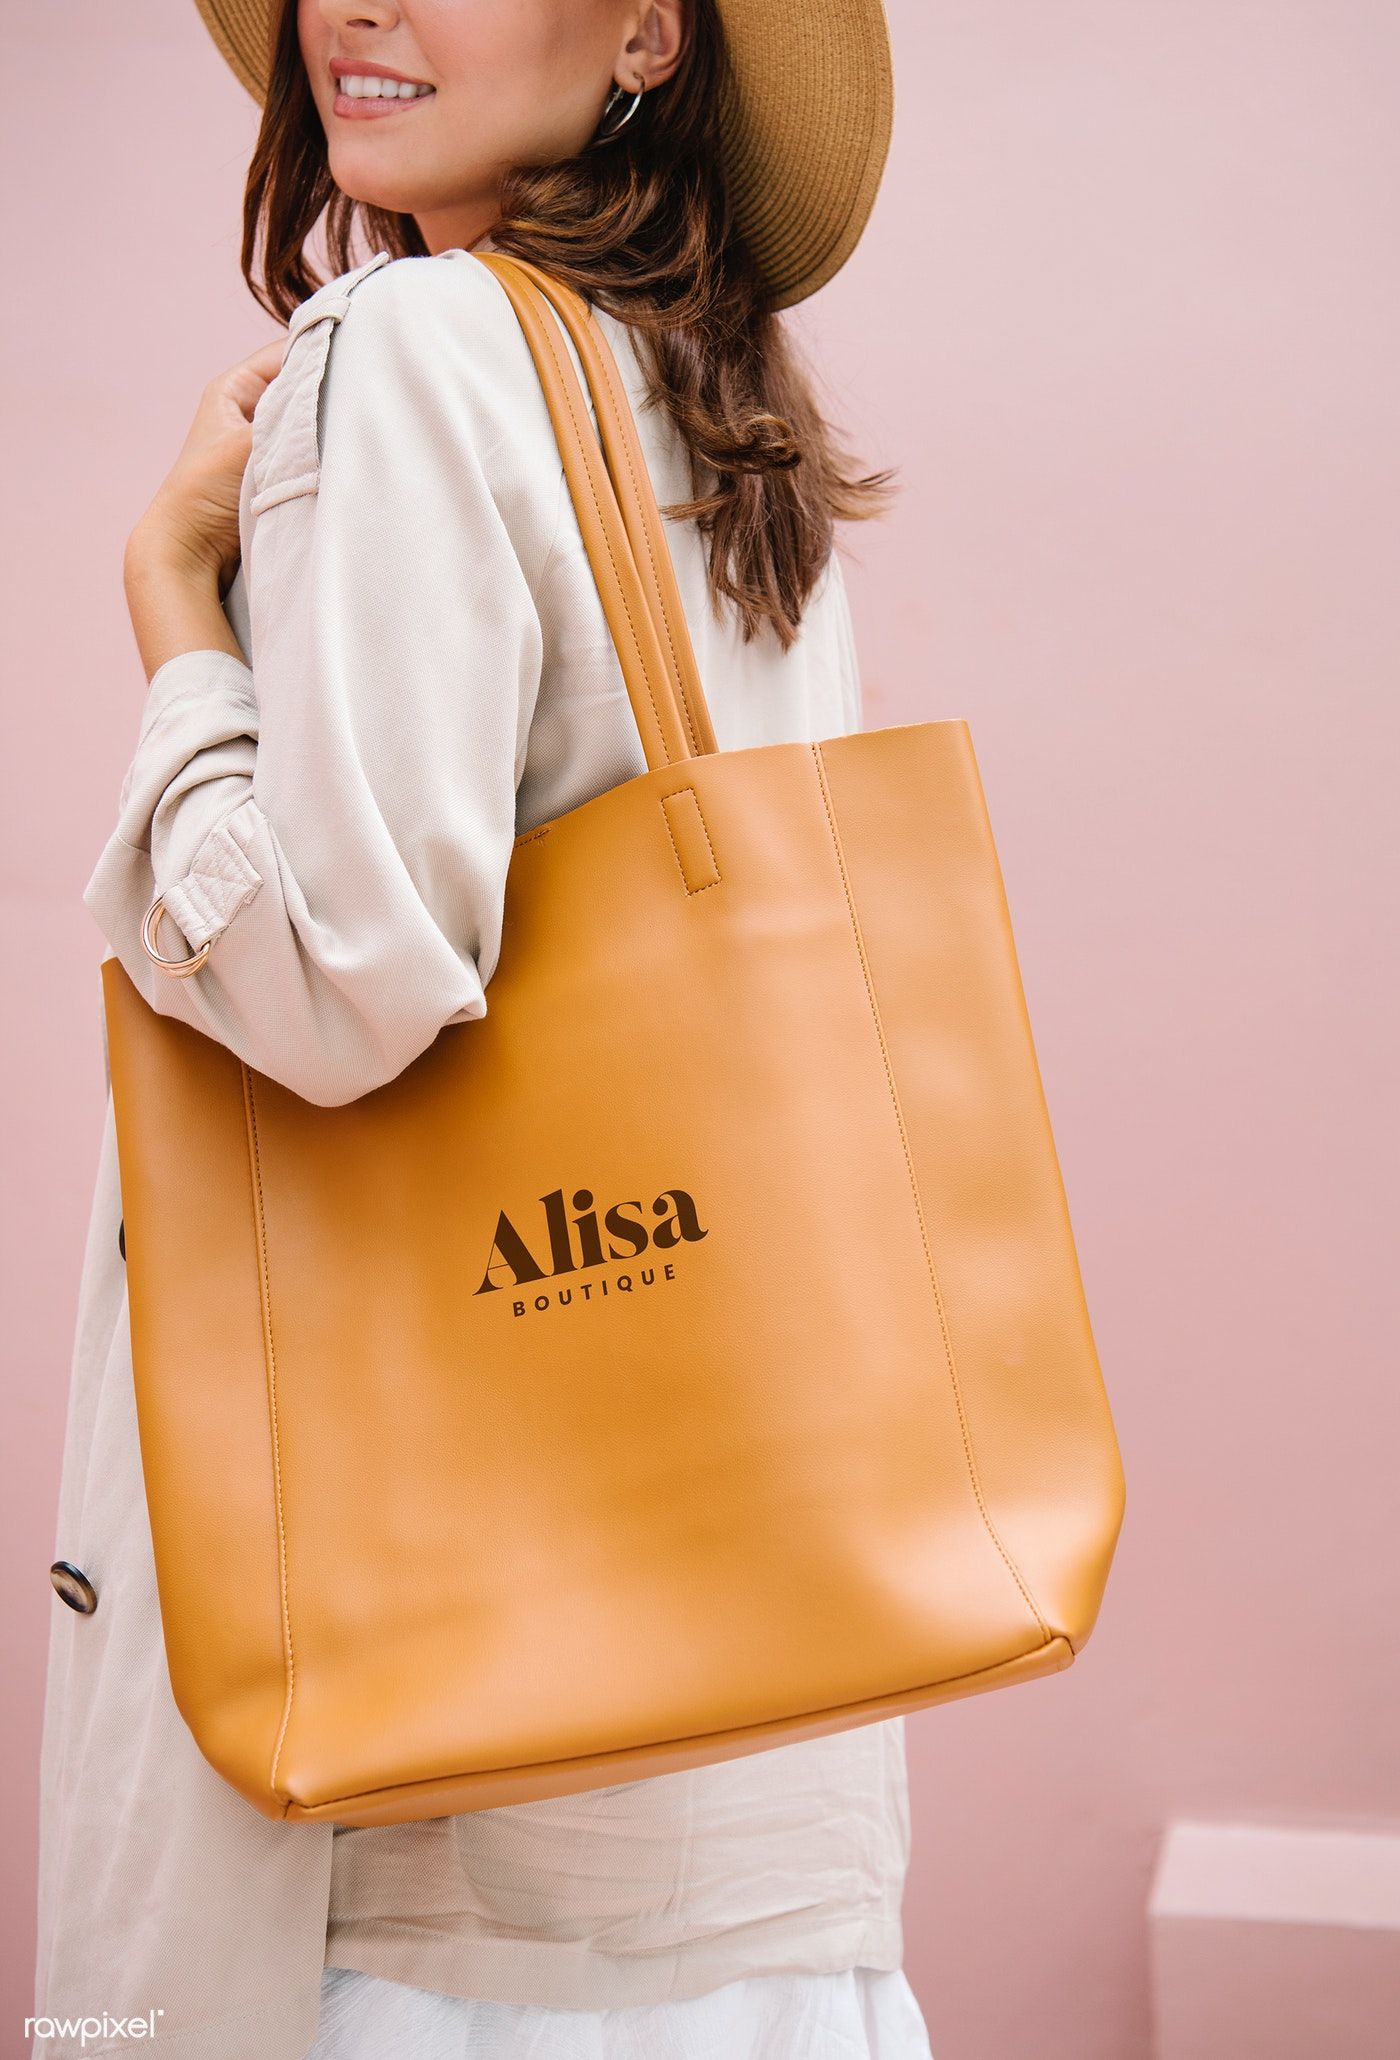 Download Download Premium Psd Of Woman Carrying A Brown Handbag Mockup 1215142